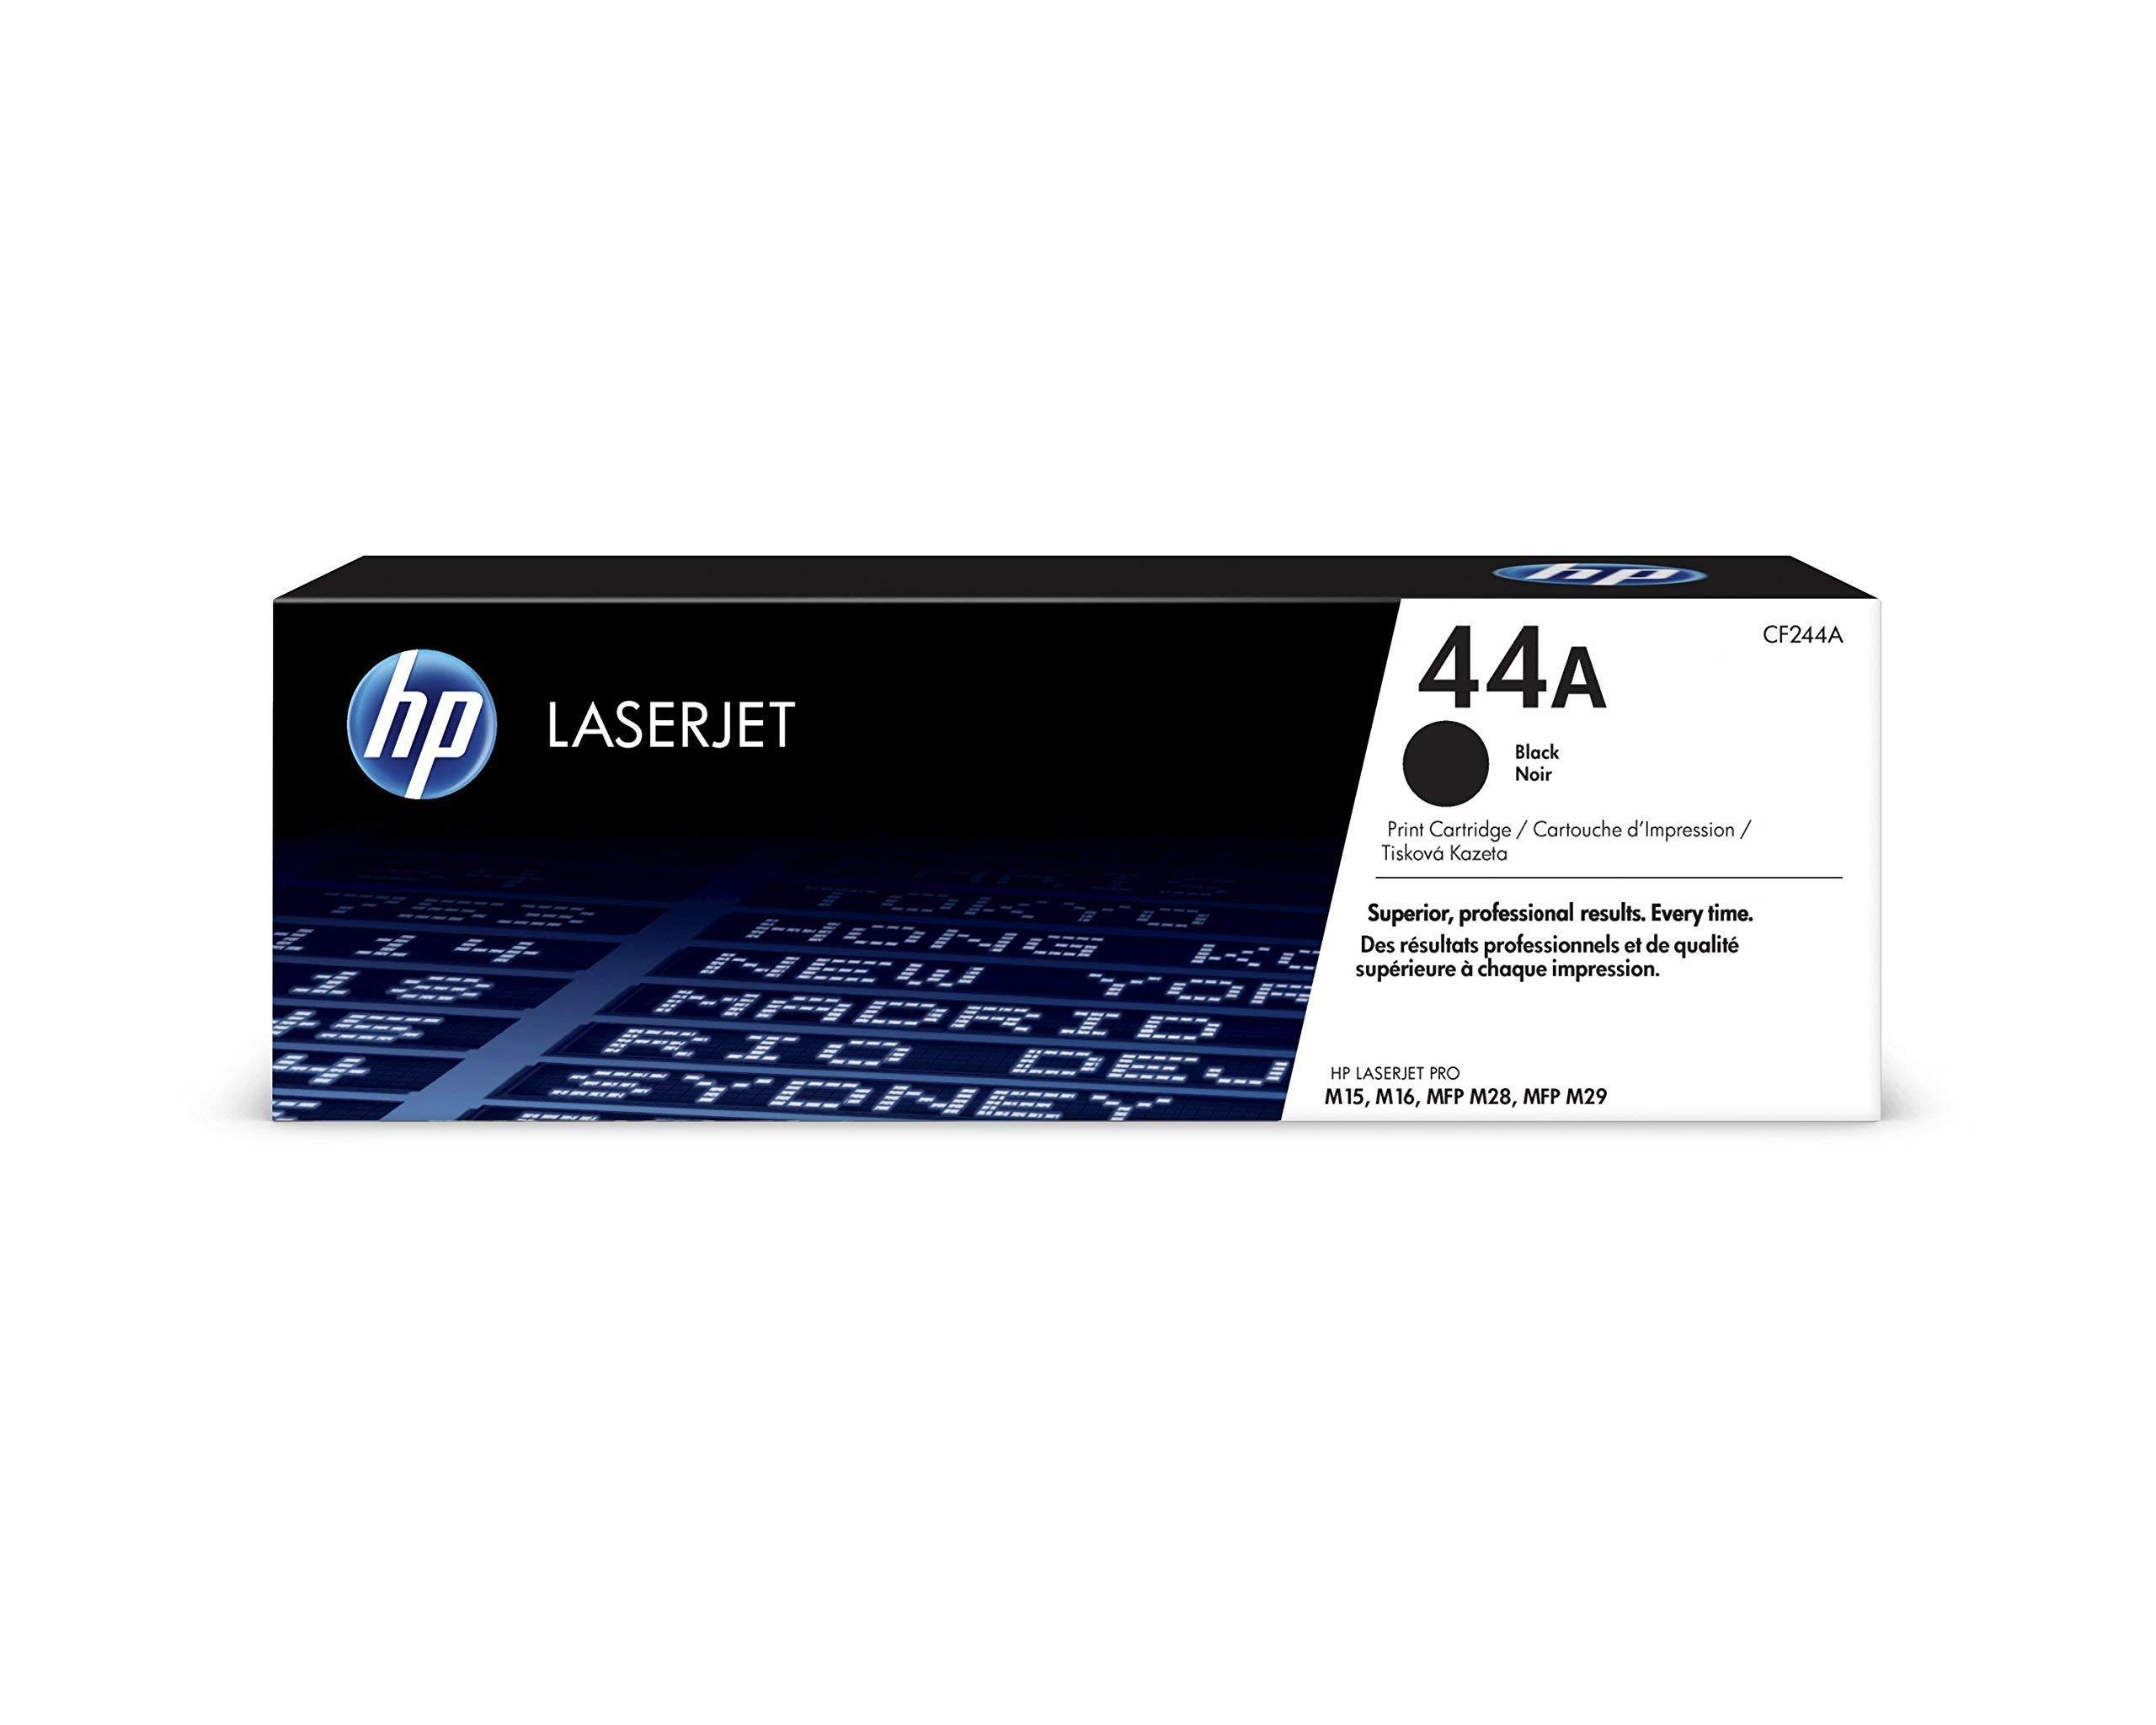 HP-44A-CF244A-Schwarz-Original-Toner-fr-HP-LaserJet-Pro-M15-HP-LaserJet-Pro-M28